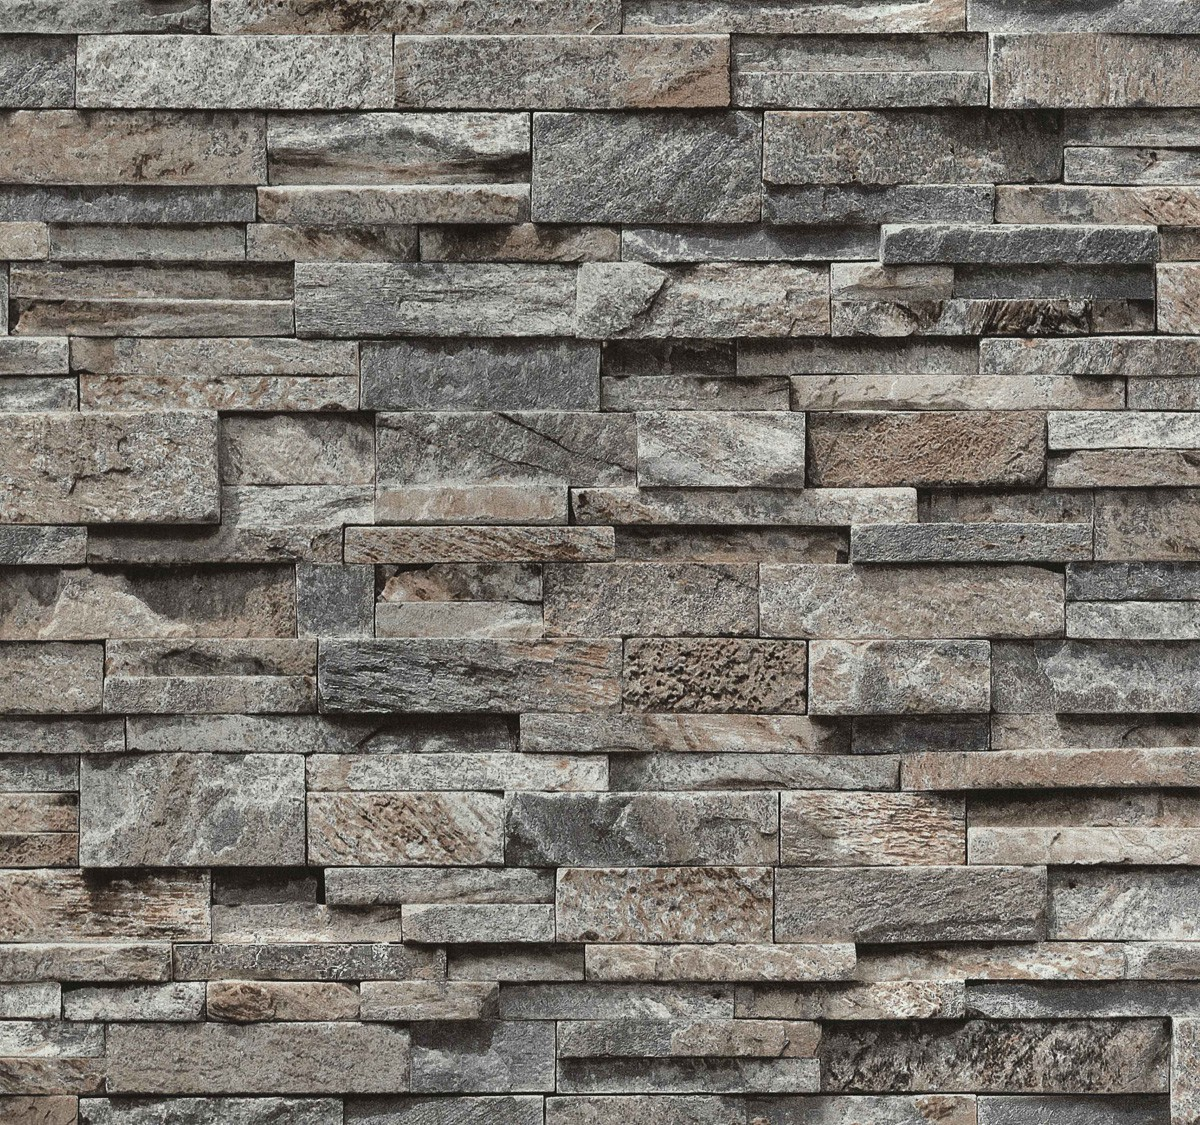 vliestapete grau steine mauer ps 02363 20. Black Bedroom Furniture Sets. Home Design Ideas